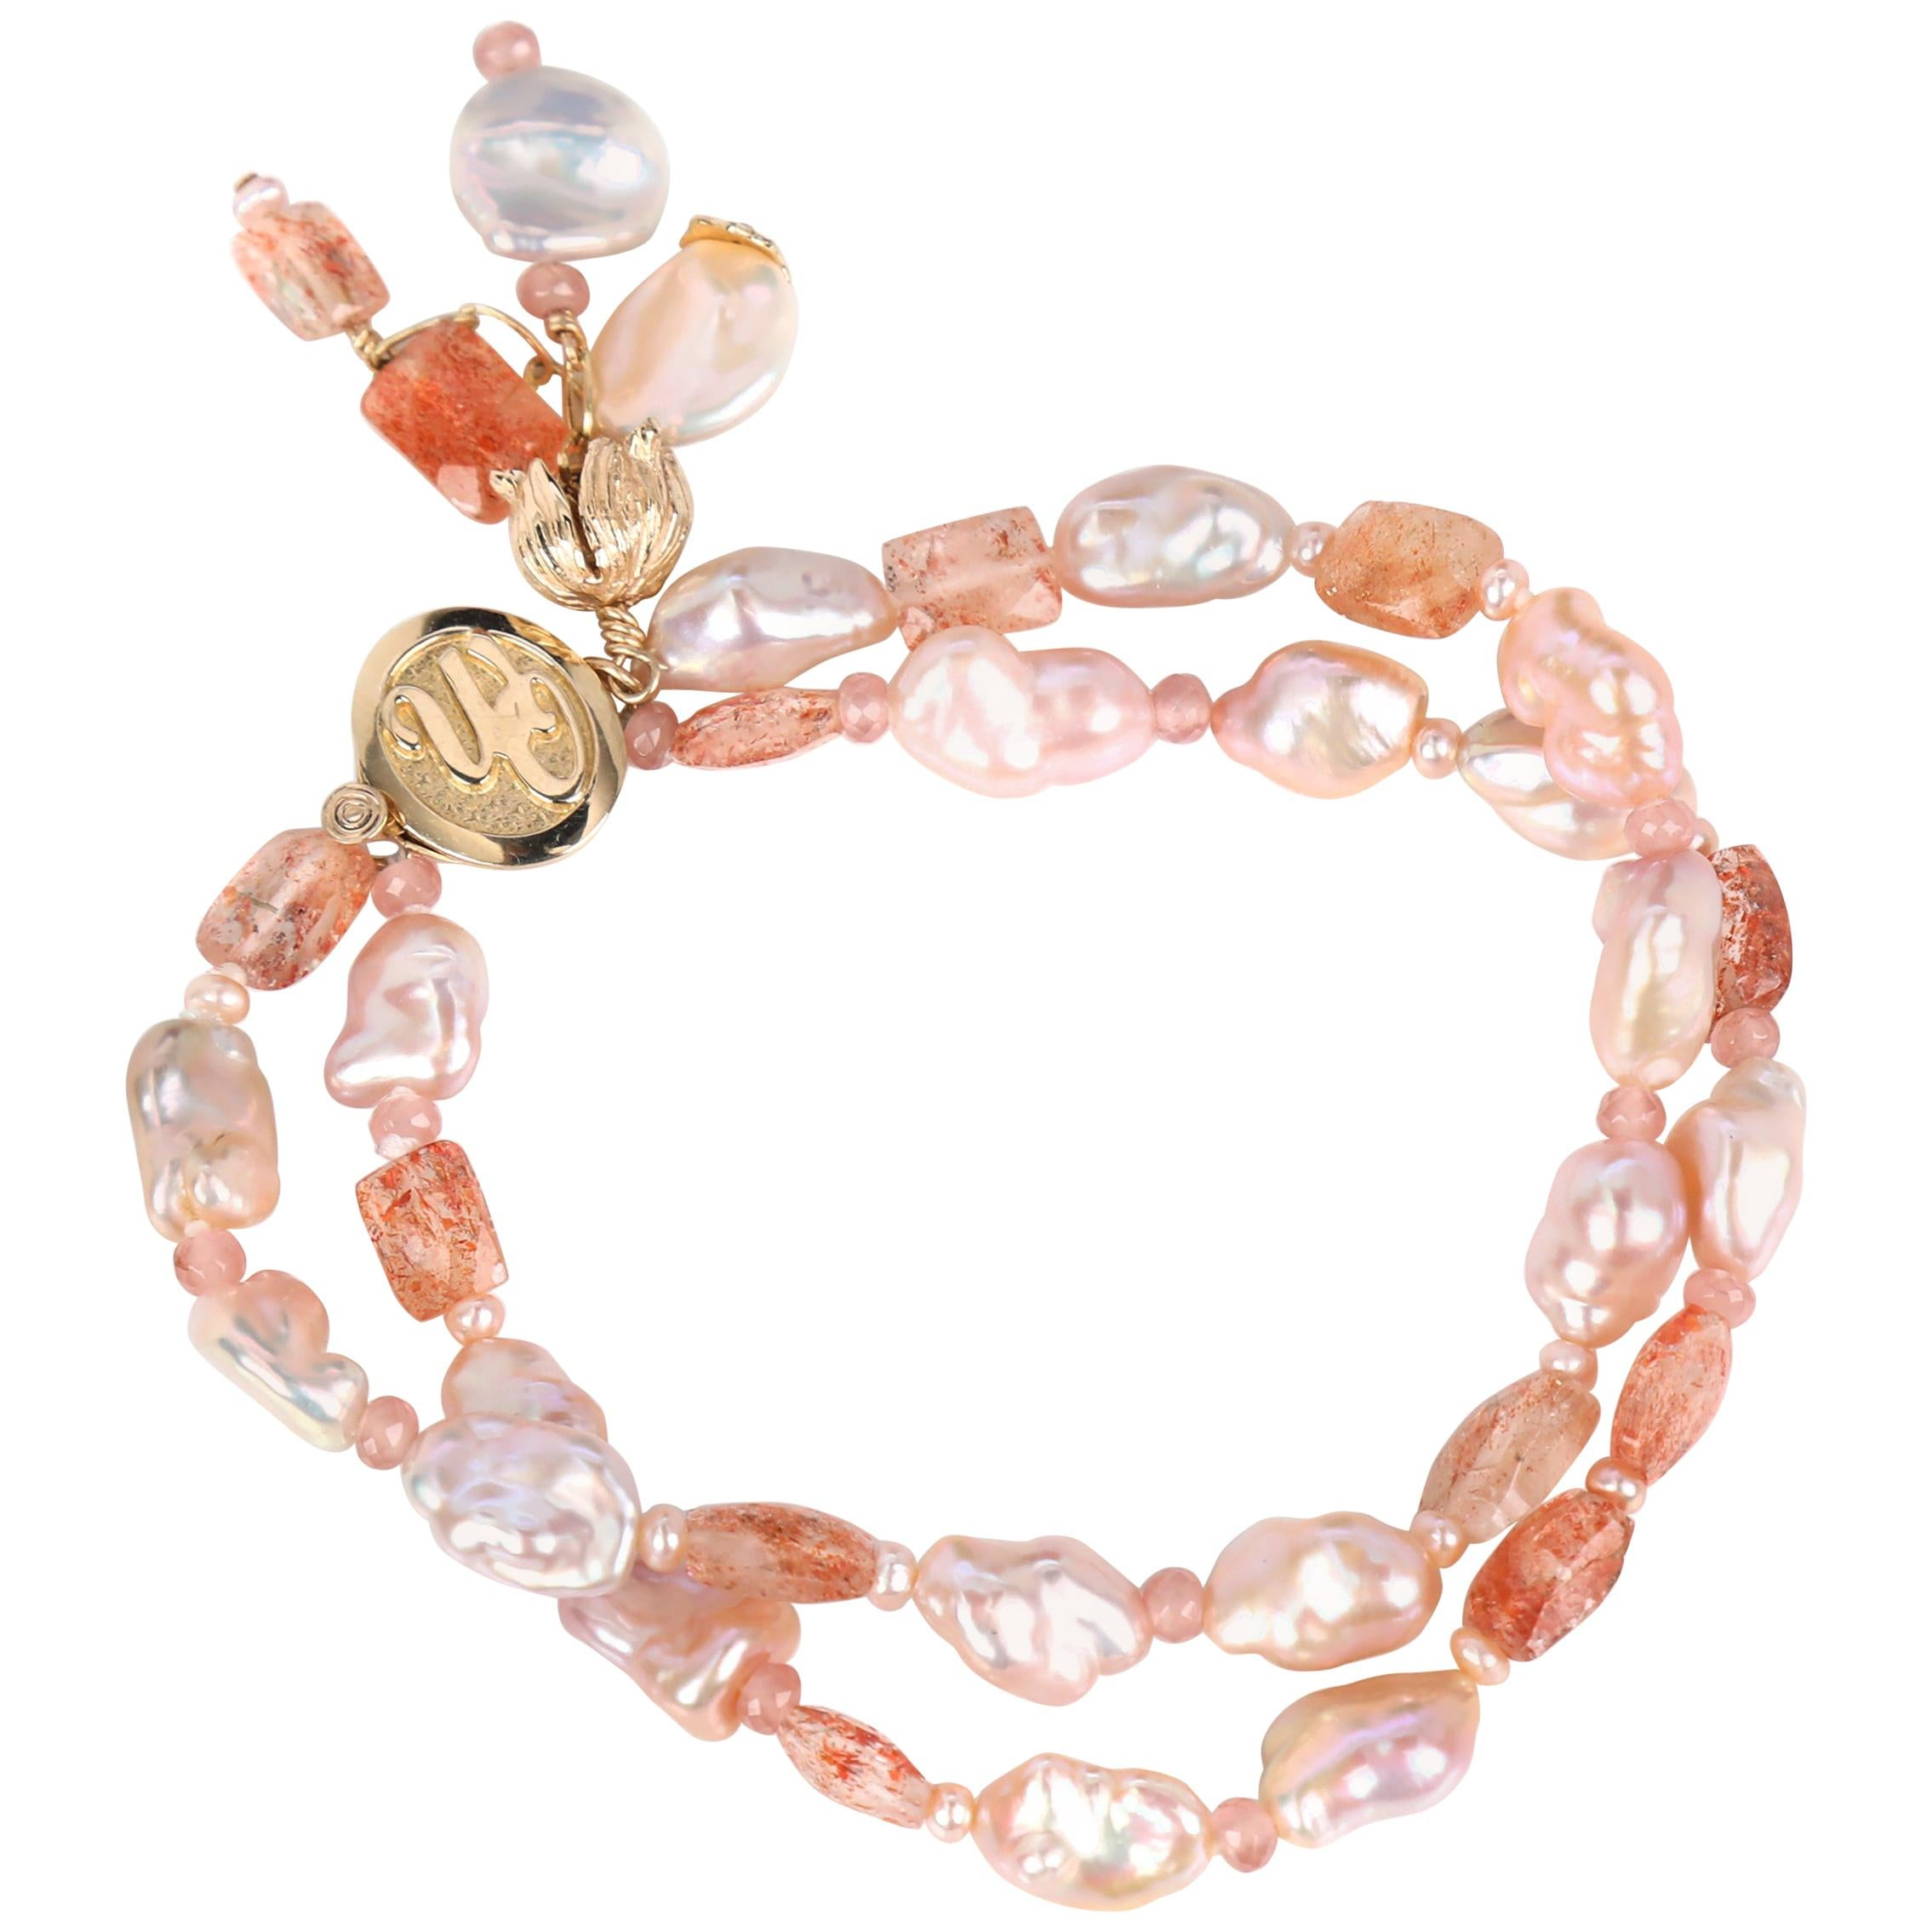 White Orchid Studio A Pocket of Sunshine Pearls Sunstone Gold Bracelet